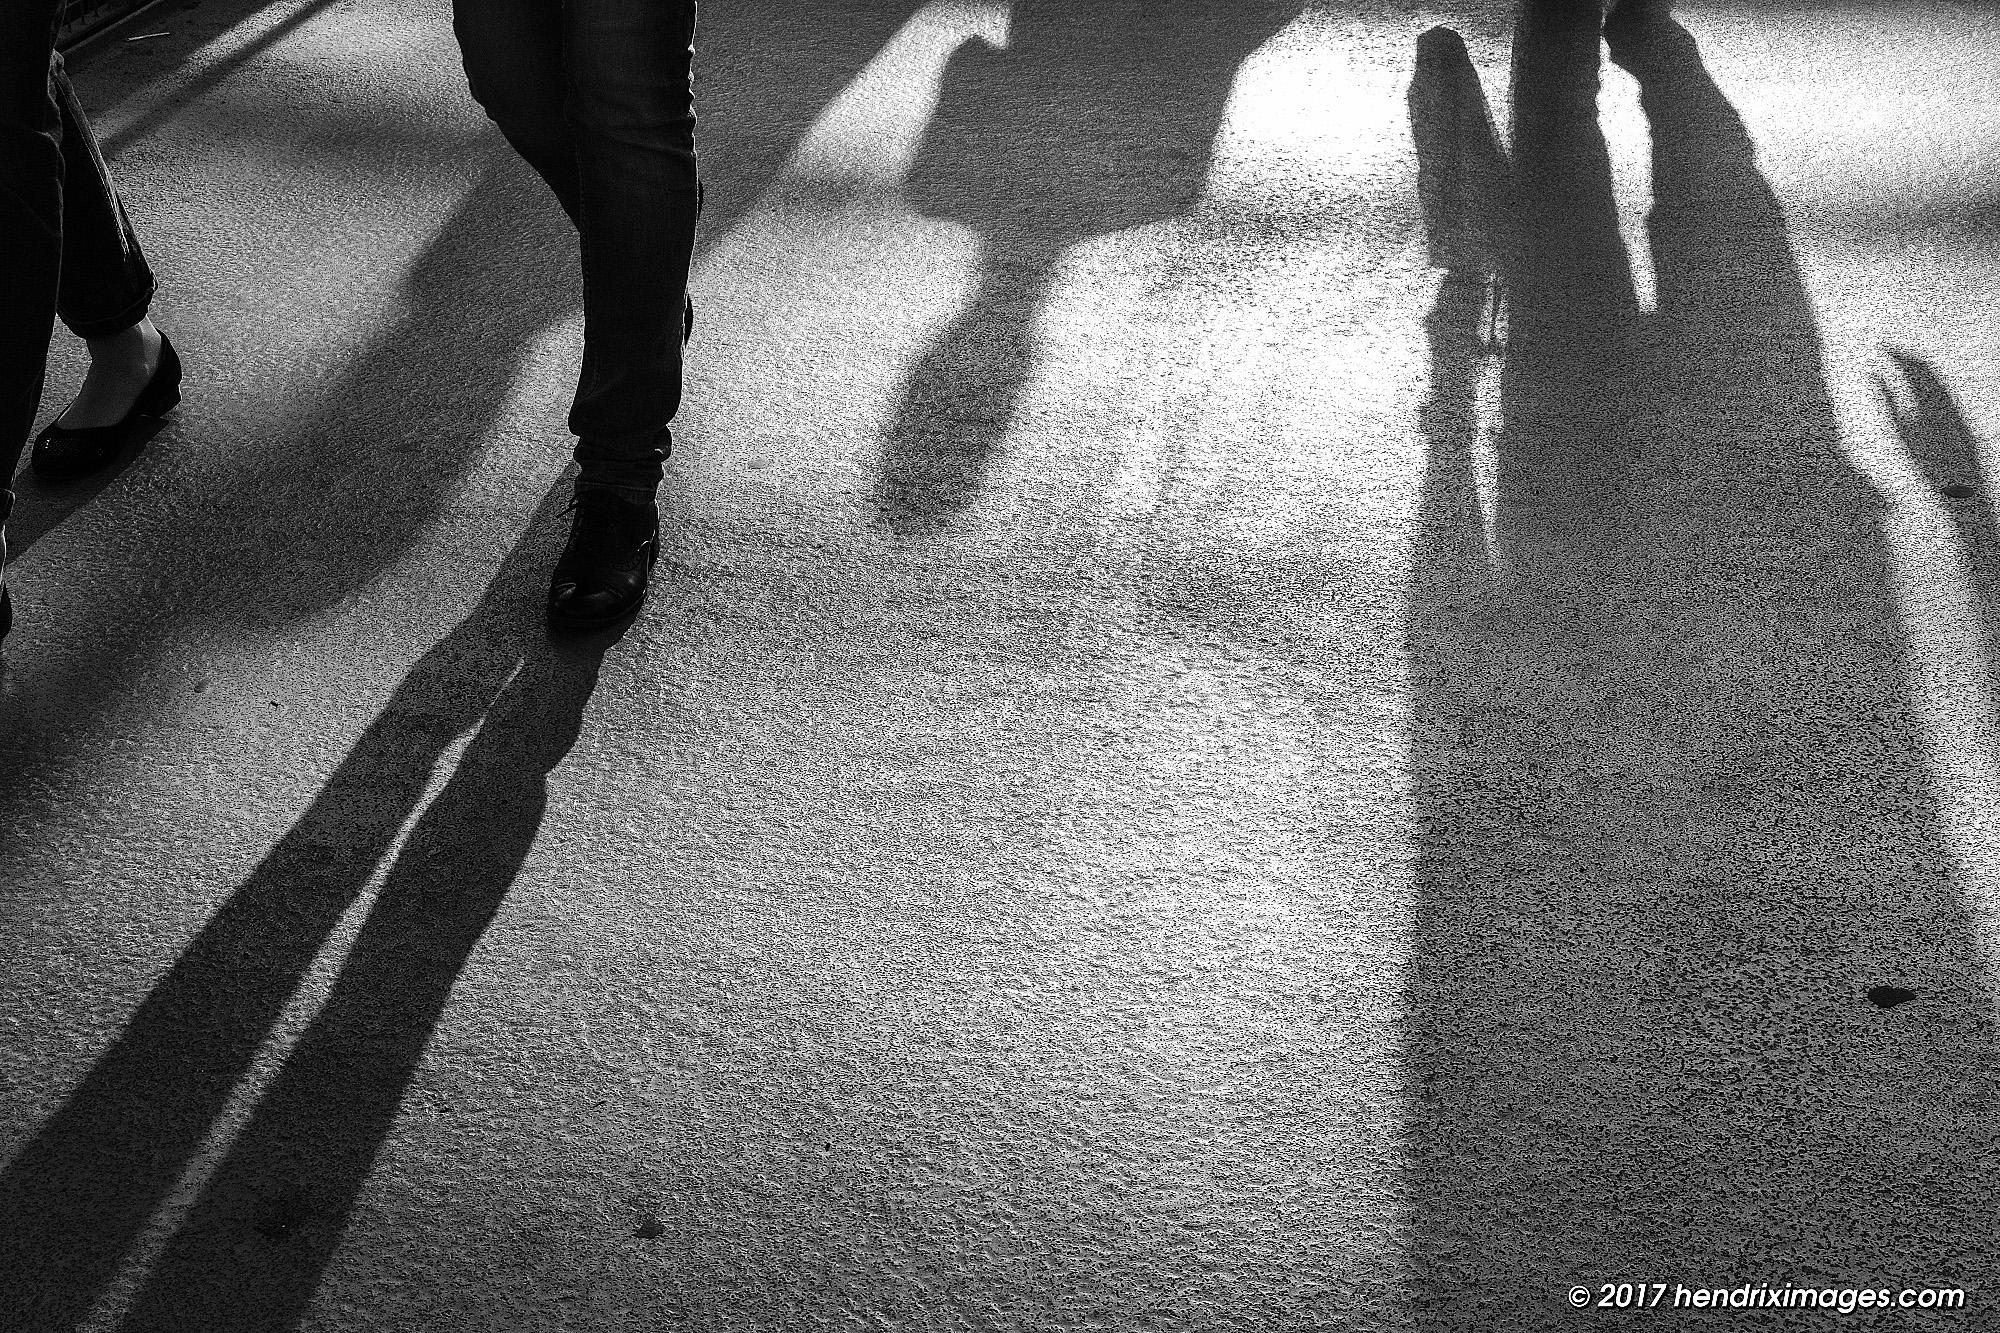 Casting Shadows Ahead,with Fuji X-Pro2 and XF 35 mm f2 WR,SOOC ACROS JPEG